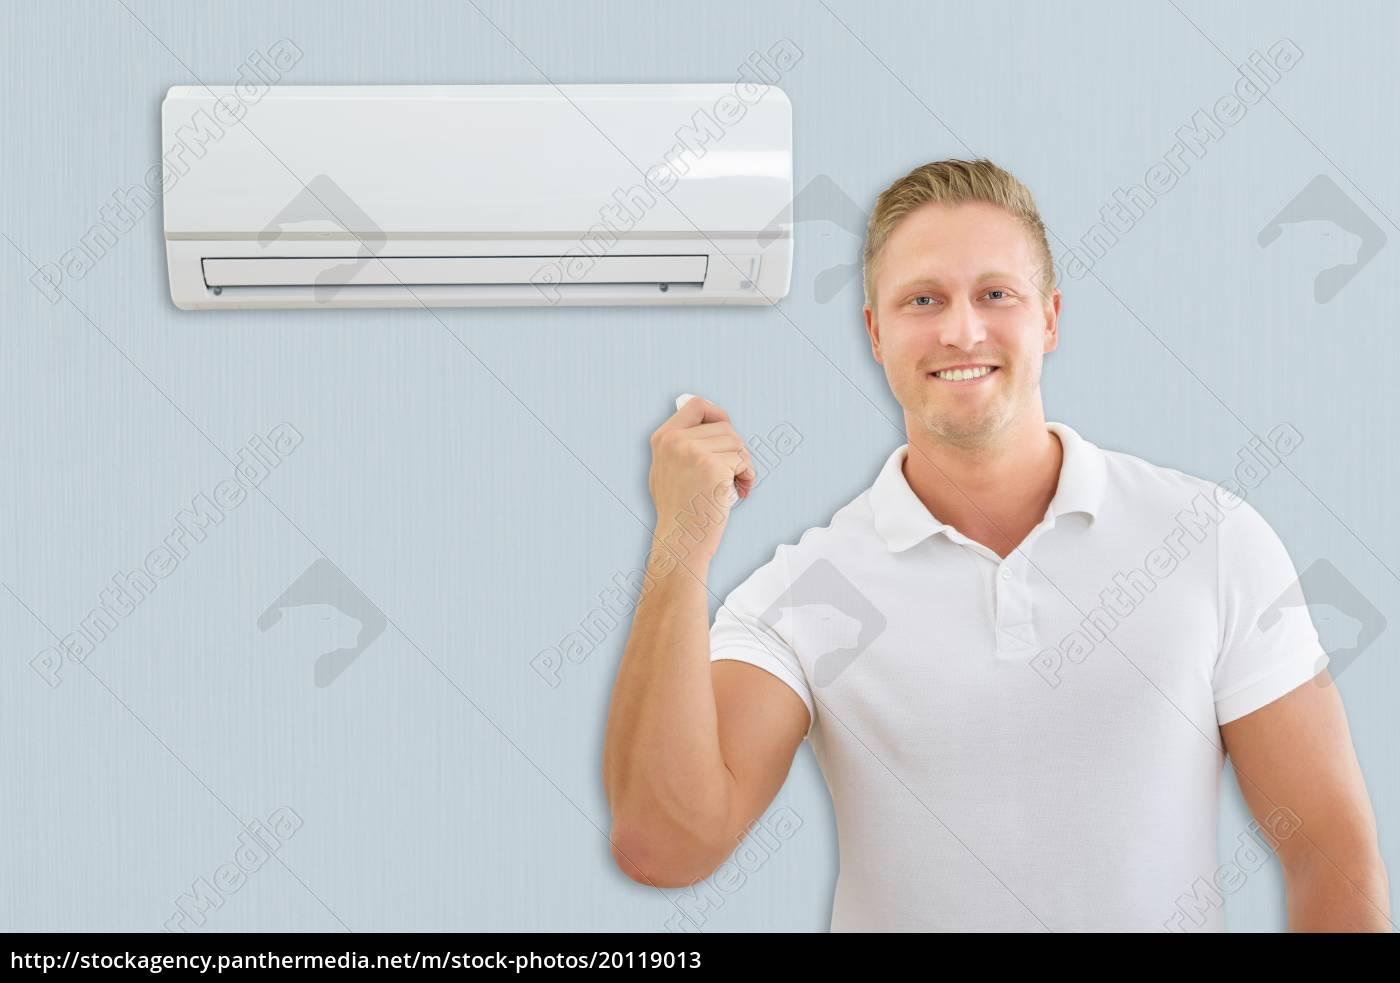 man, with, air, conditioner, remote, control - 20119013